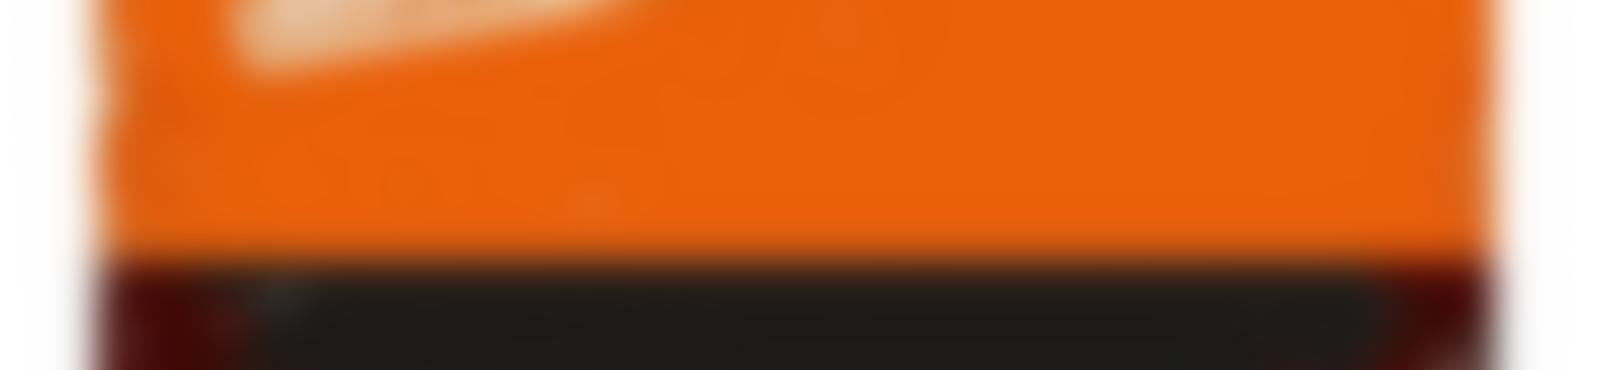 Blurred 49157d93 d82e 44fb 9b1f 6eef012c80c4